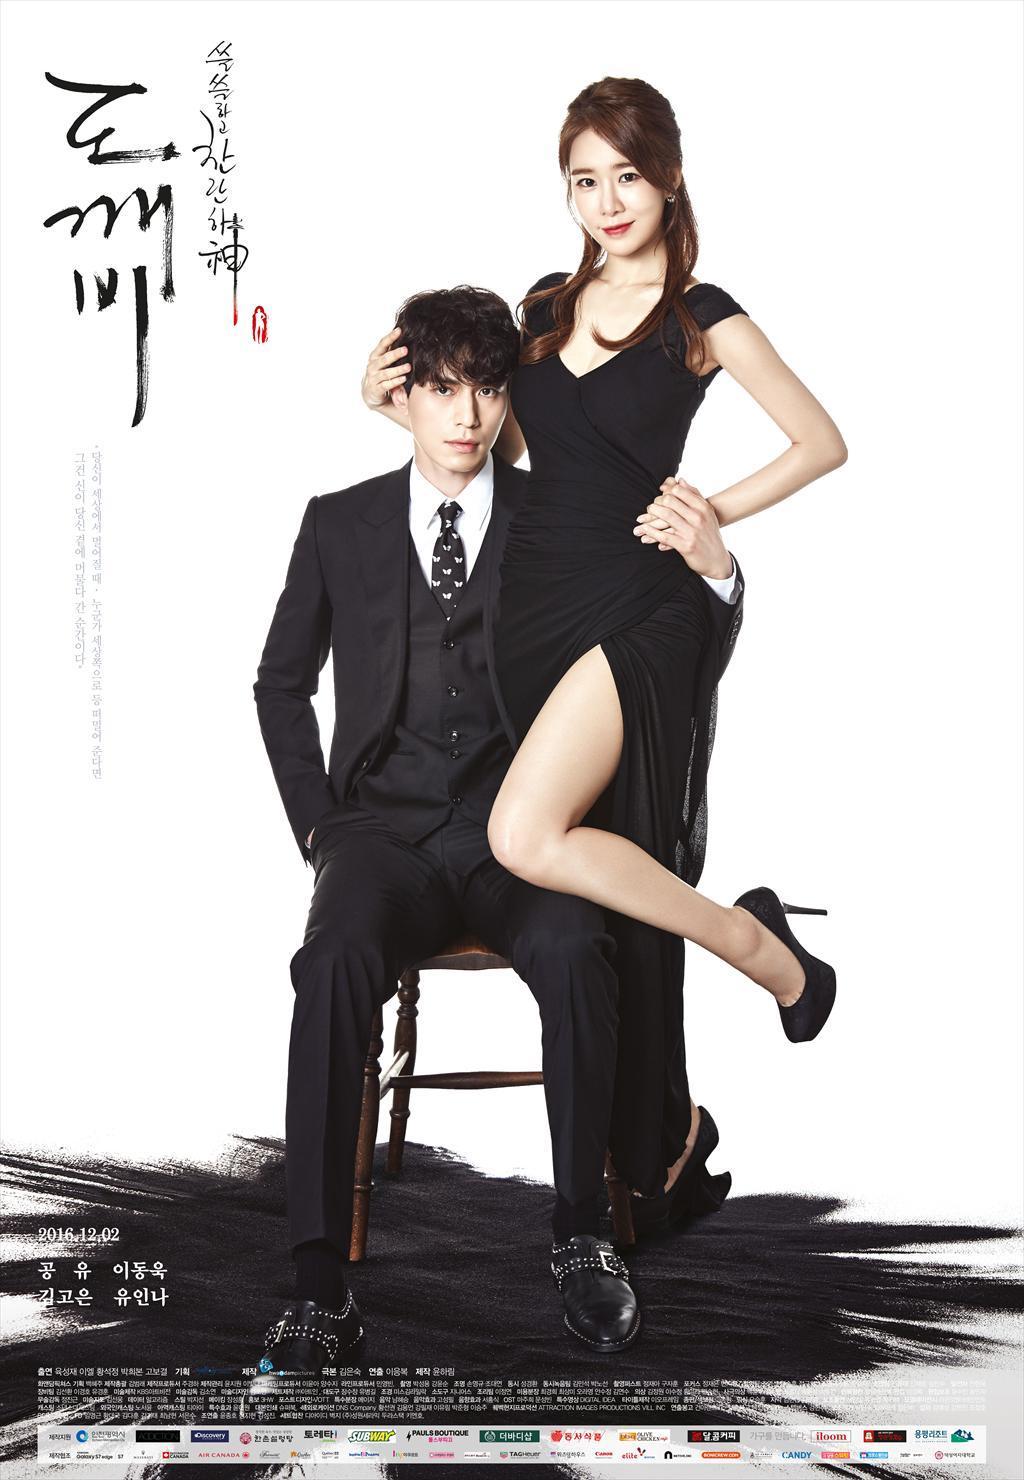 #3 [tvN 10주년 특별기획] 도깨비 이동욱.김고은 2인 커플 포스터.jpg